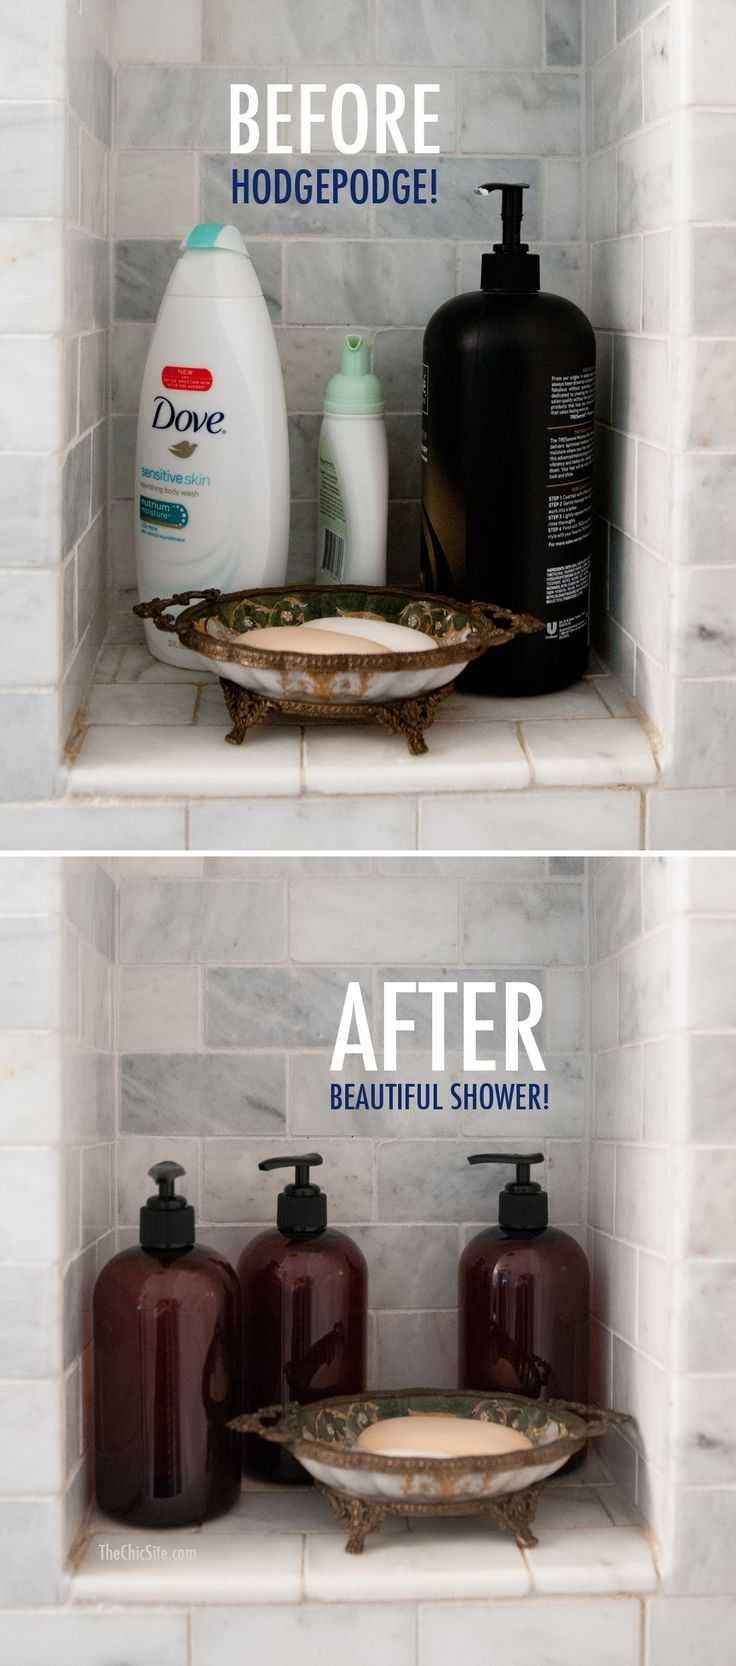 Bathroom Beautiful Spa Accessories Inspirations Also At Home Lighting Decor Ideas Best правильный беспорядок Pinterest Bathrooms